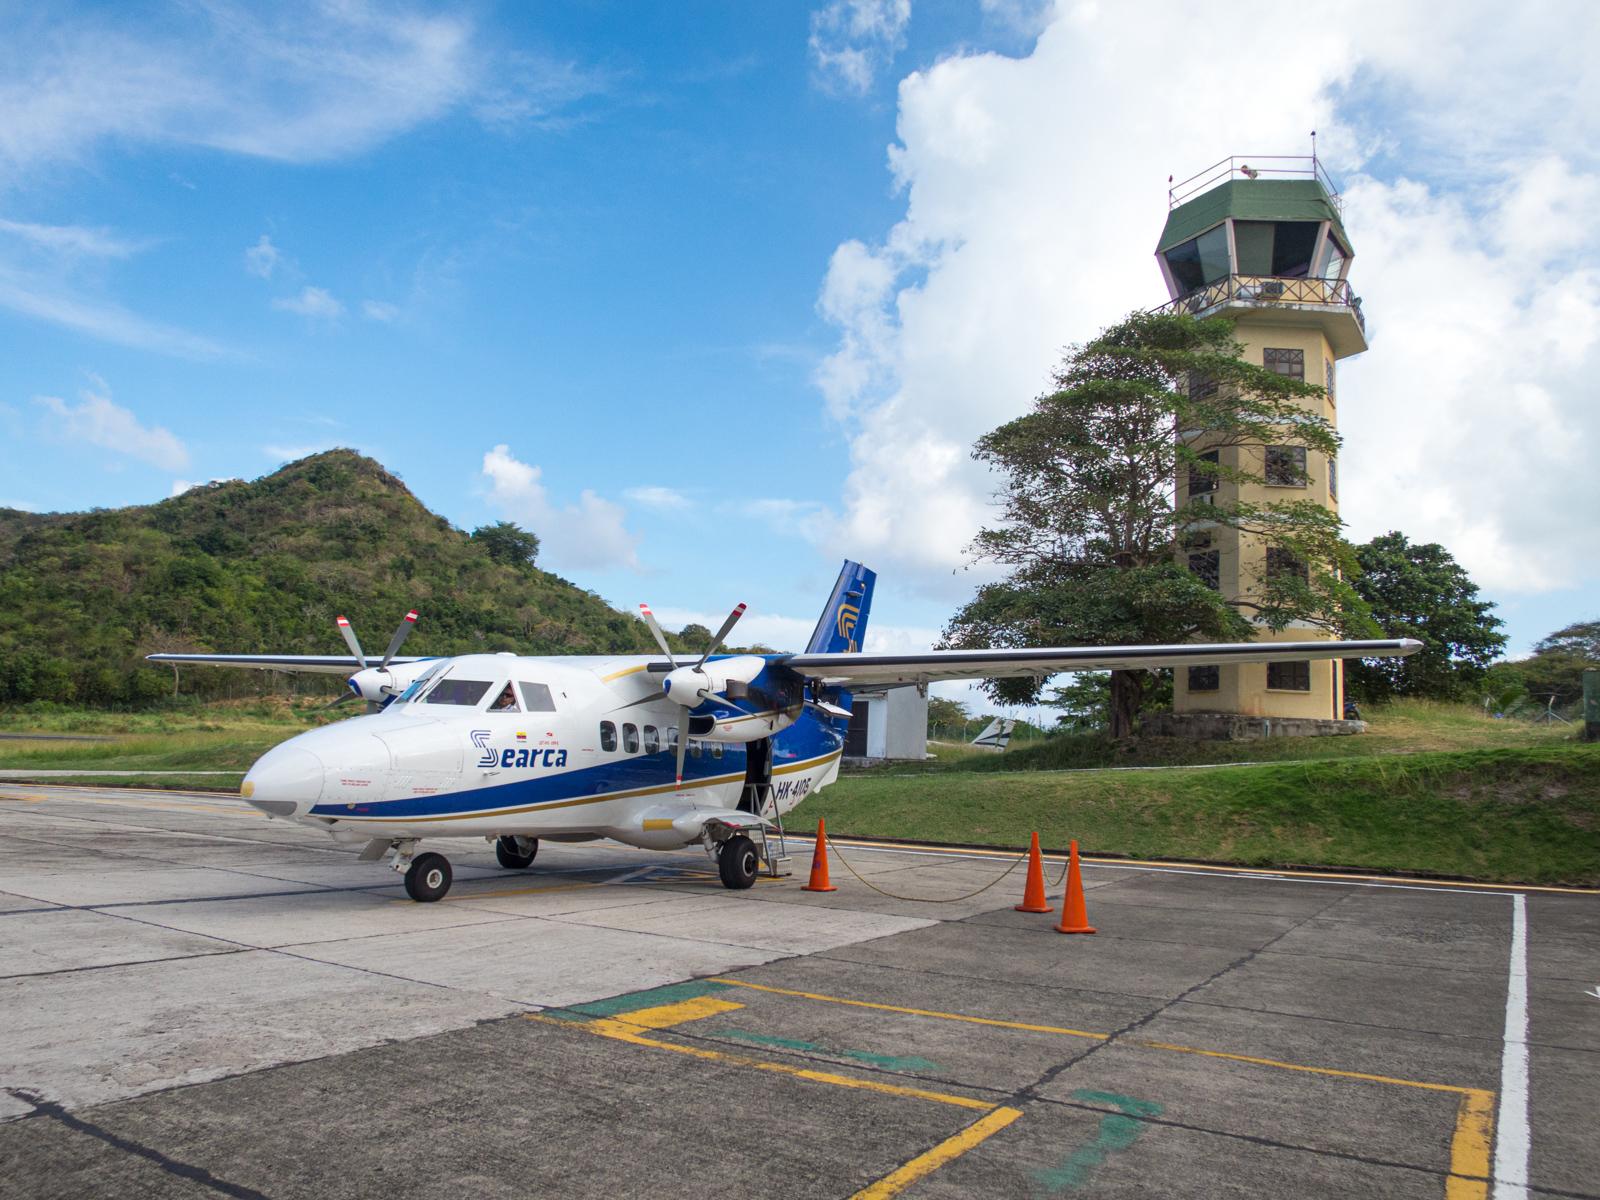 Providencia island airport